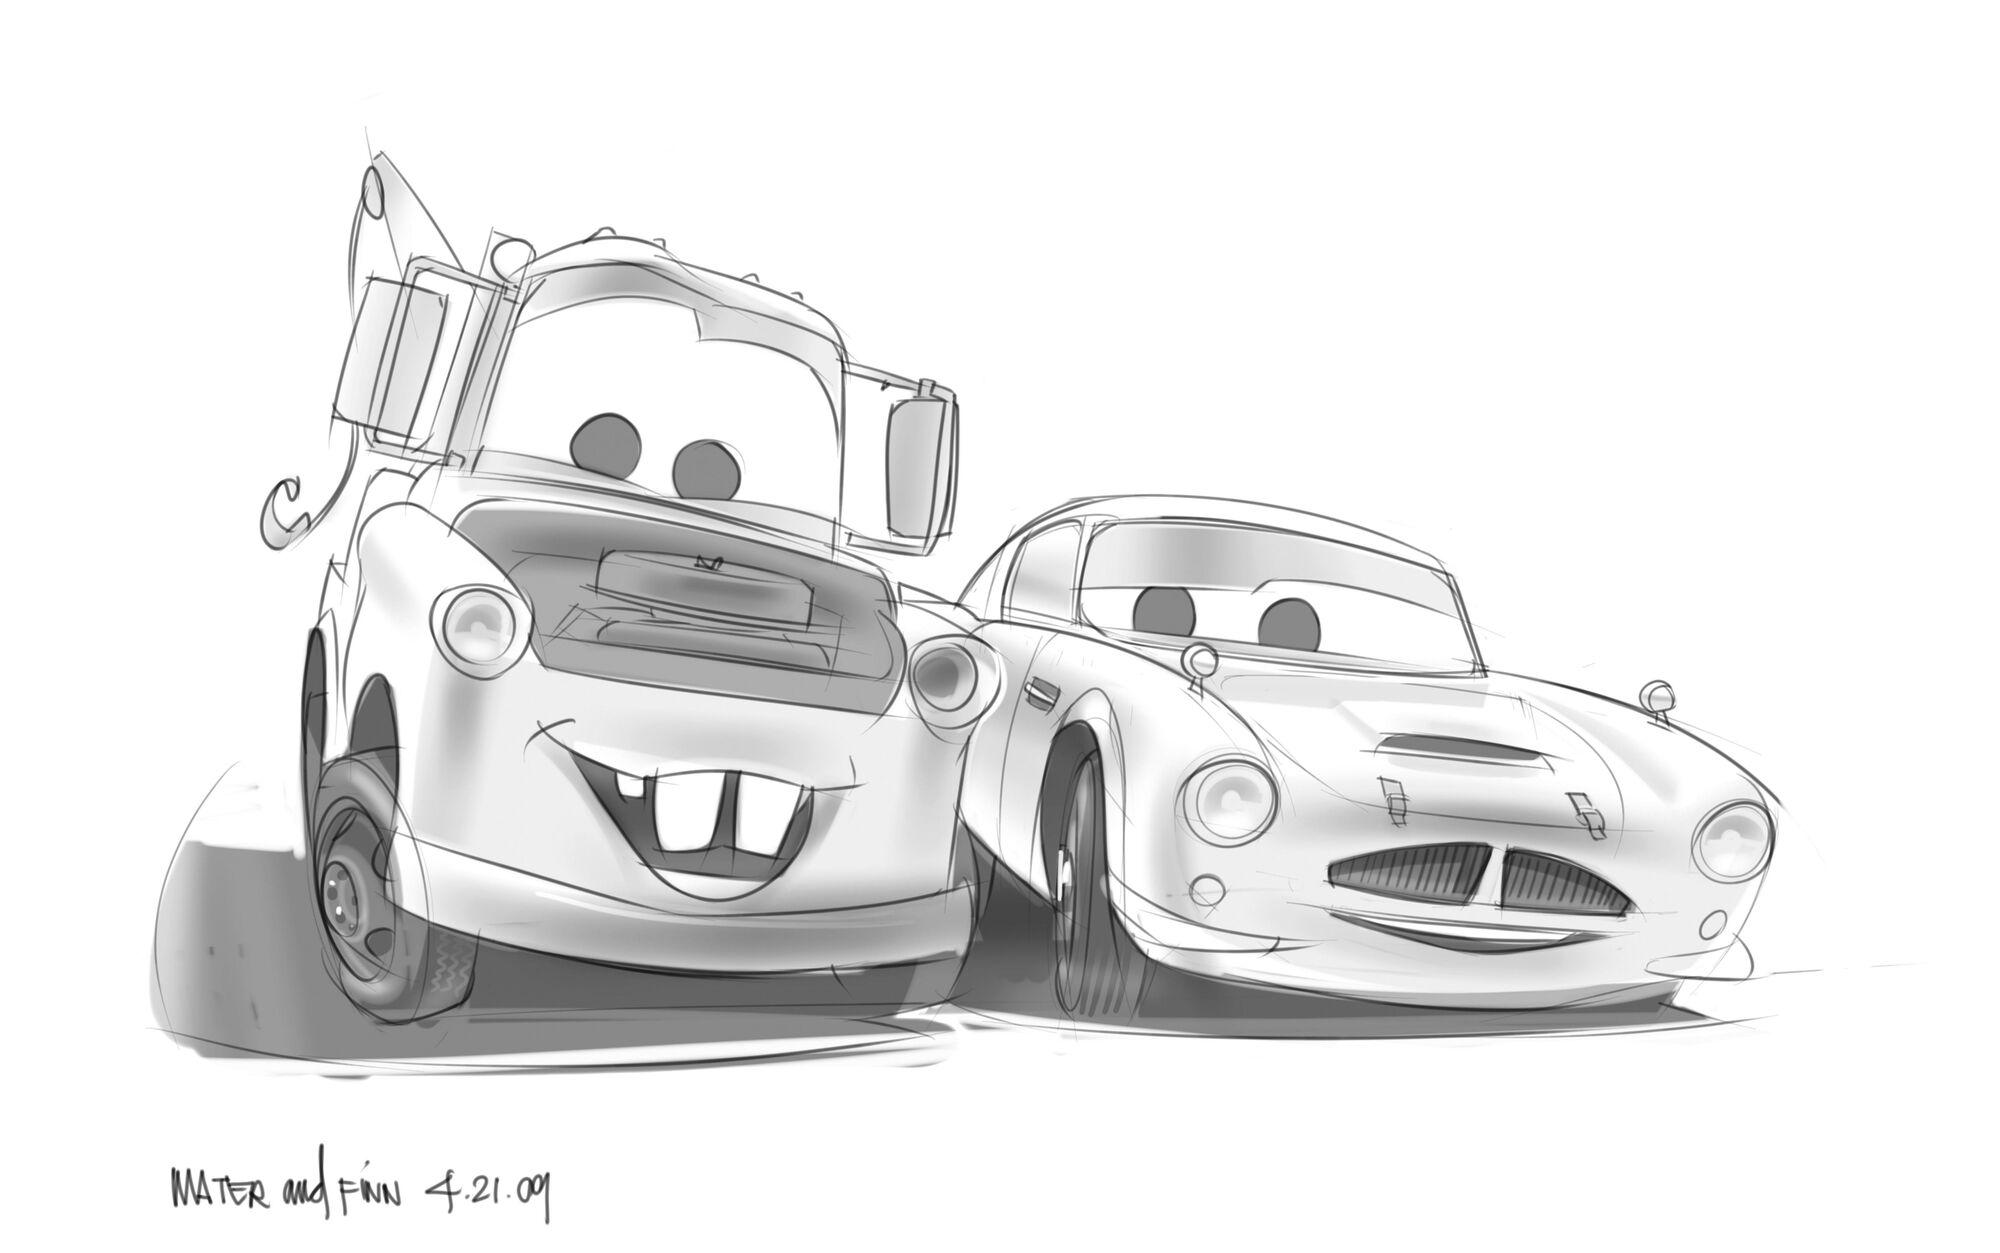 Cars Kleurplaat Finn Image Cars 2 Conceptart Finn Mcmissile 4 Jpg Pixar